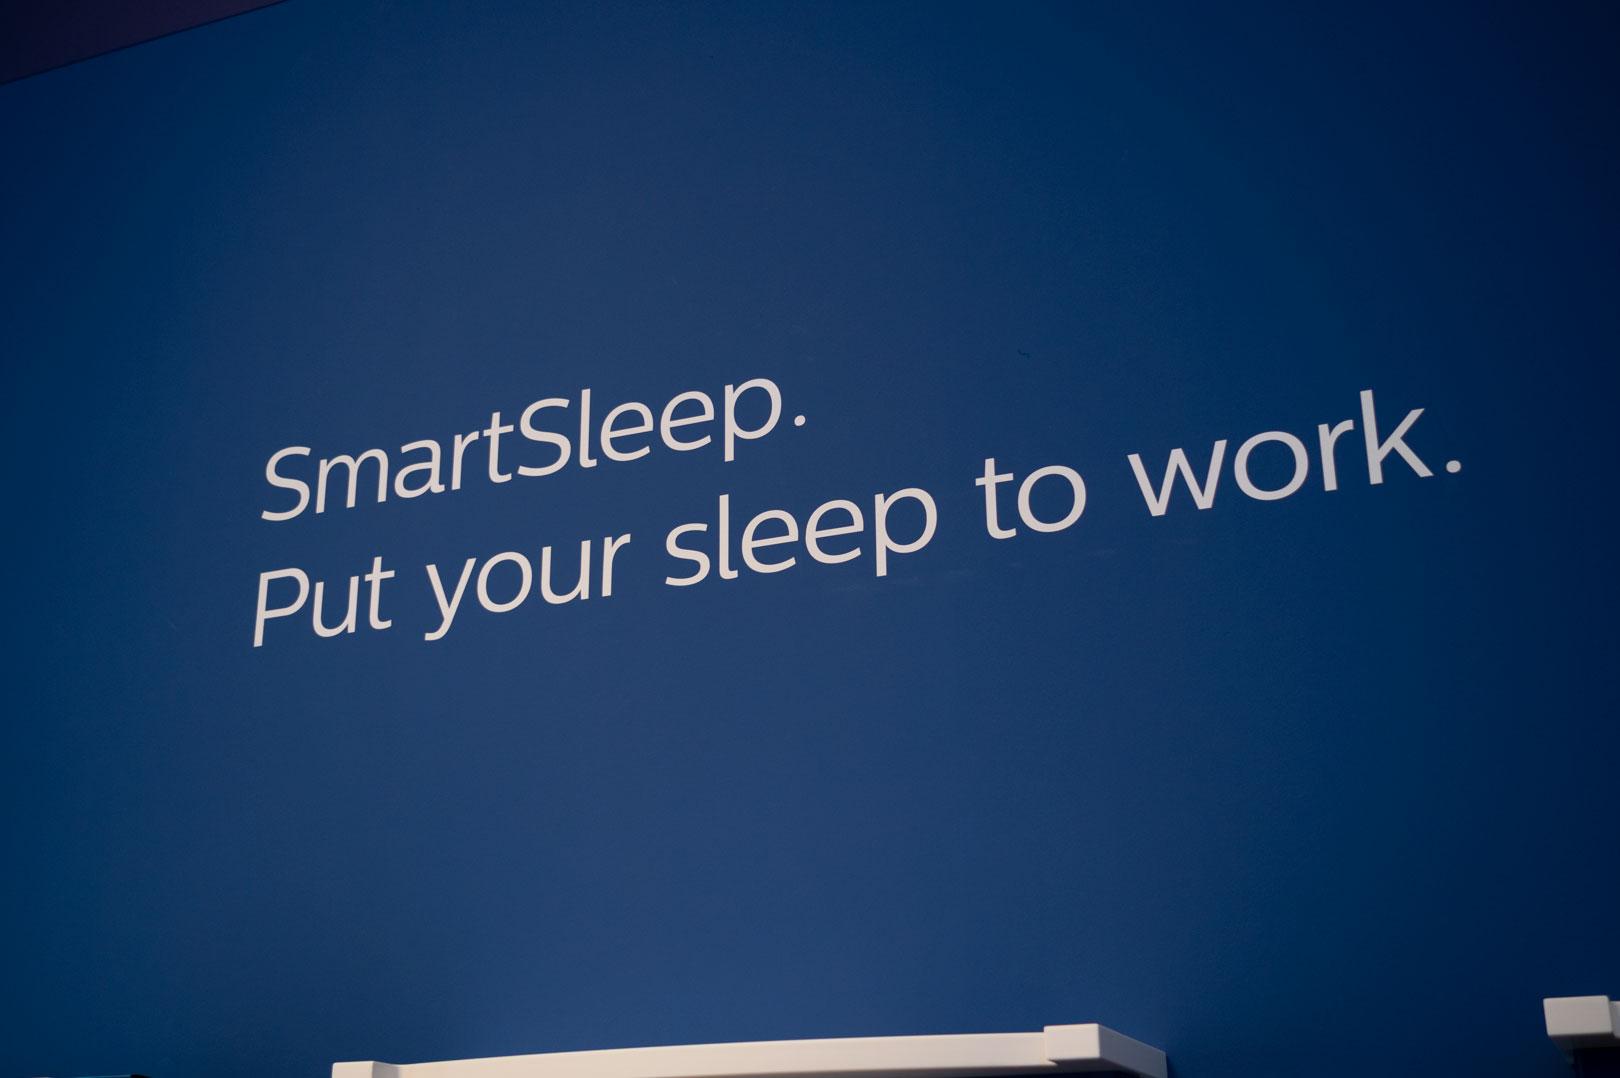 Put your sleep to work